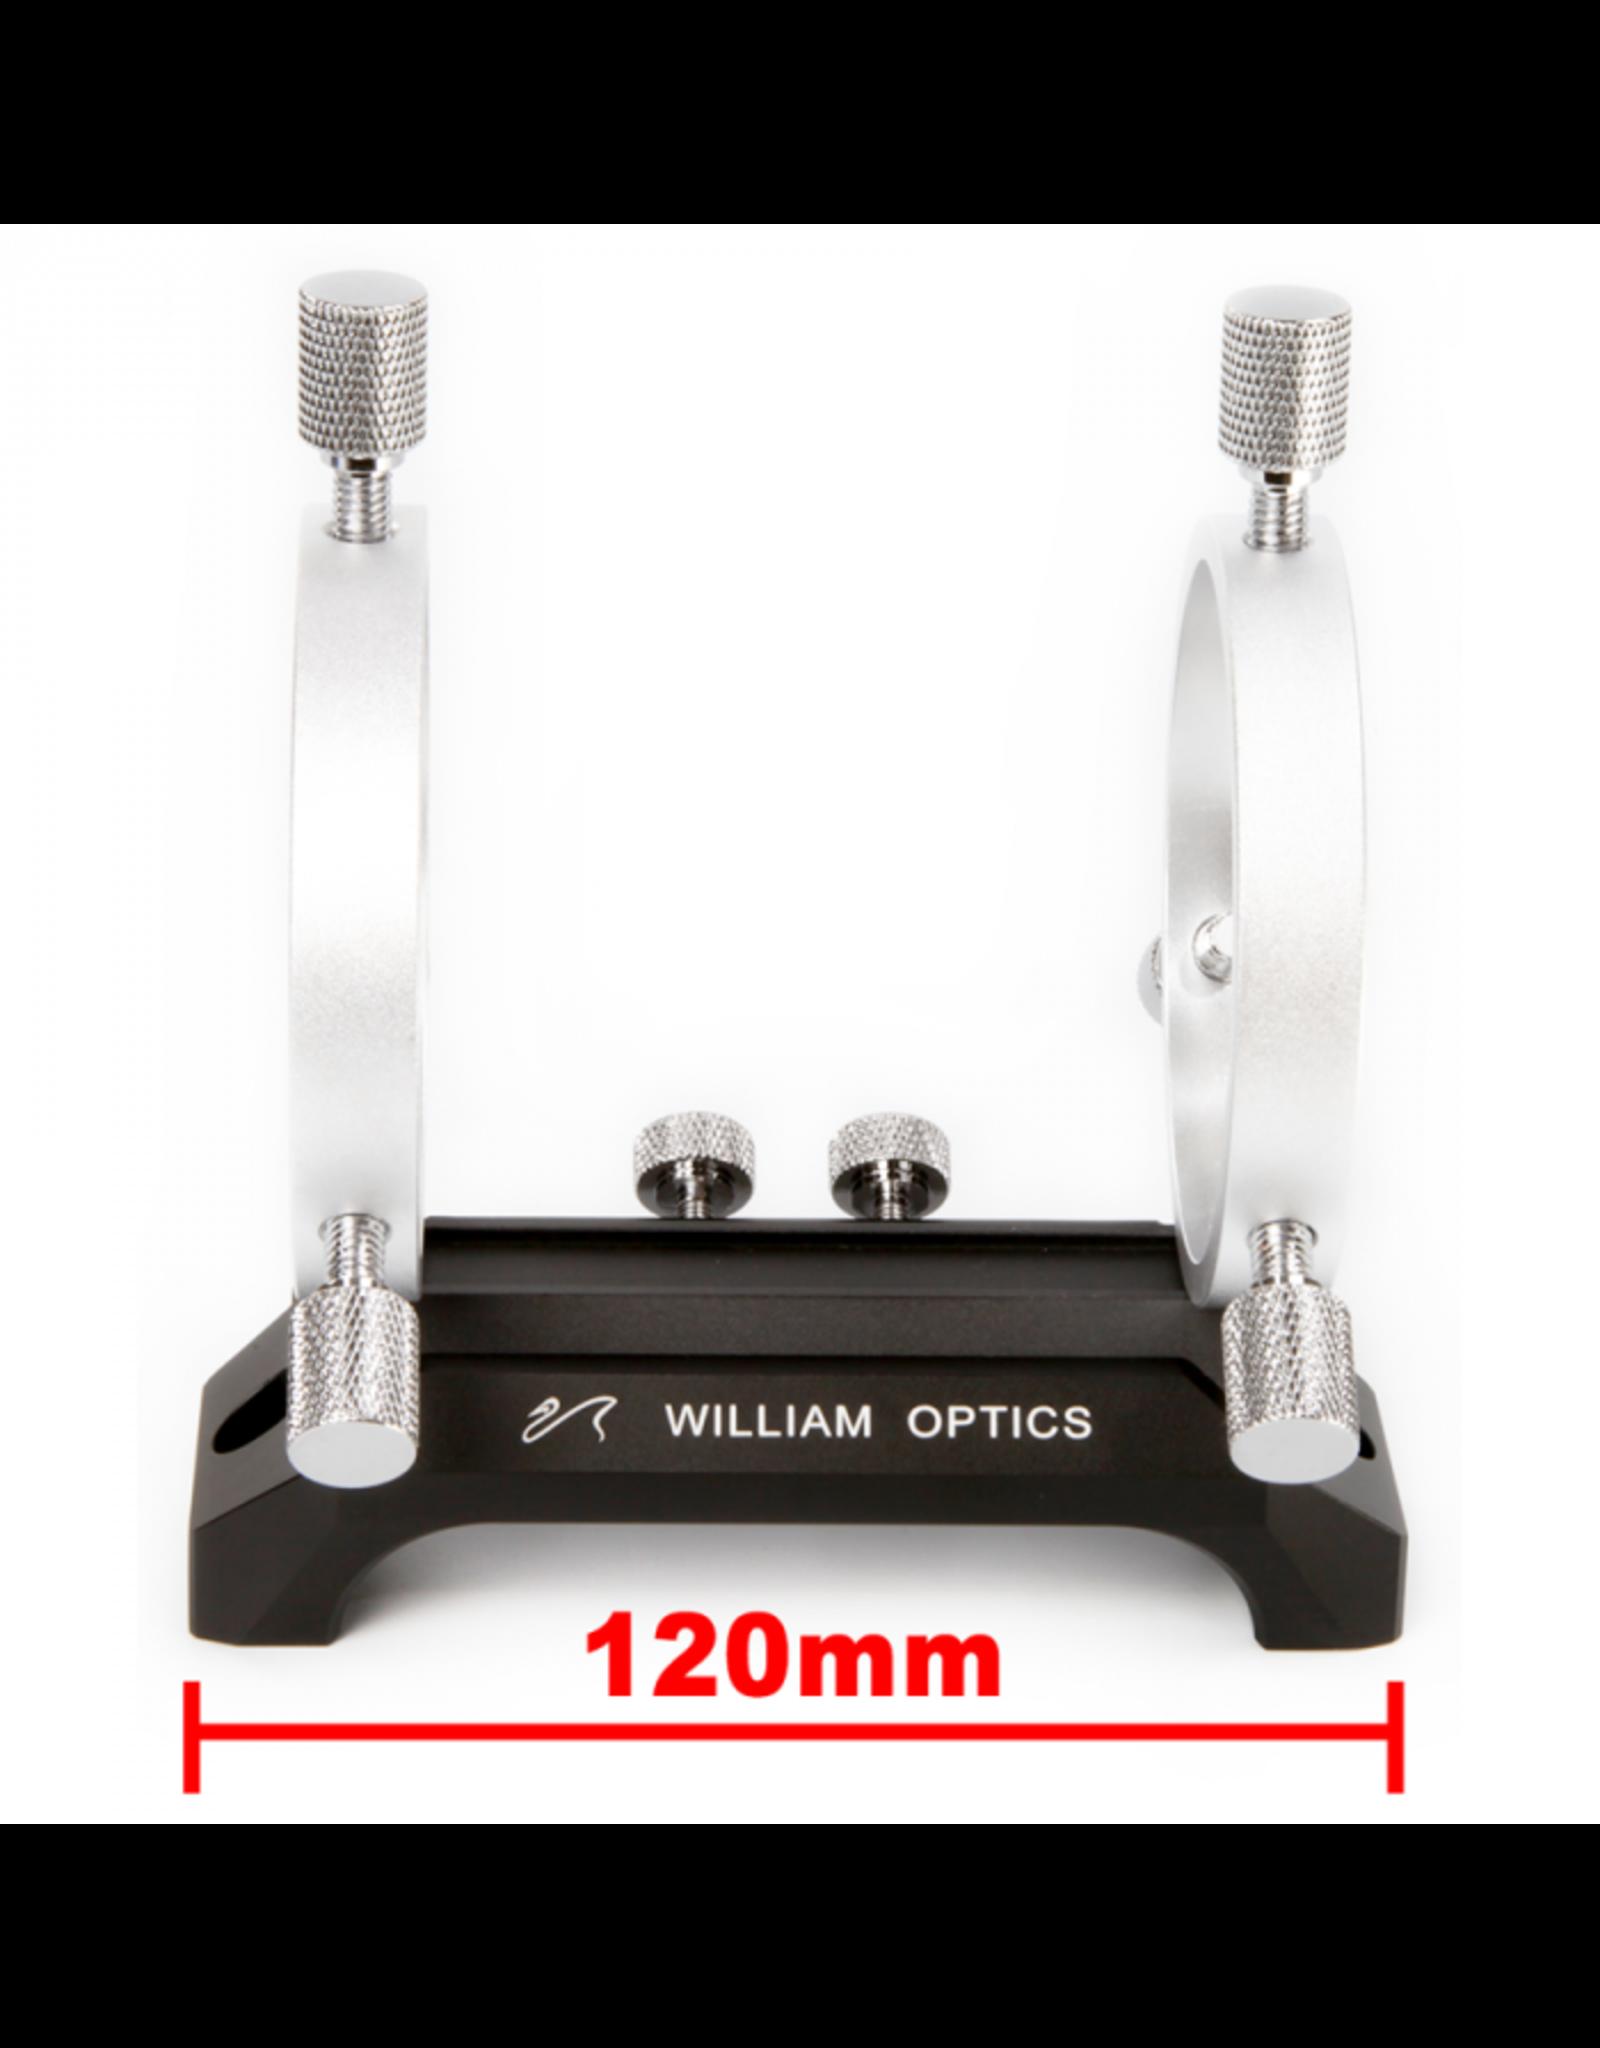 William Optics William Optics 120mm Saddle Handle & 50mm Silver Guiding Rings w/ Adjustment Screws - M-HC120BL-GR50SL